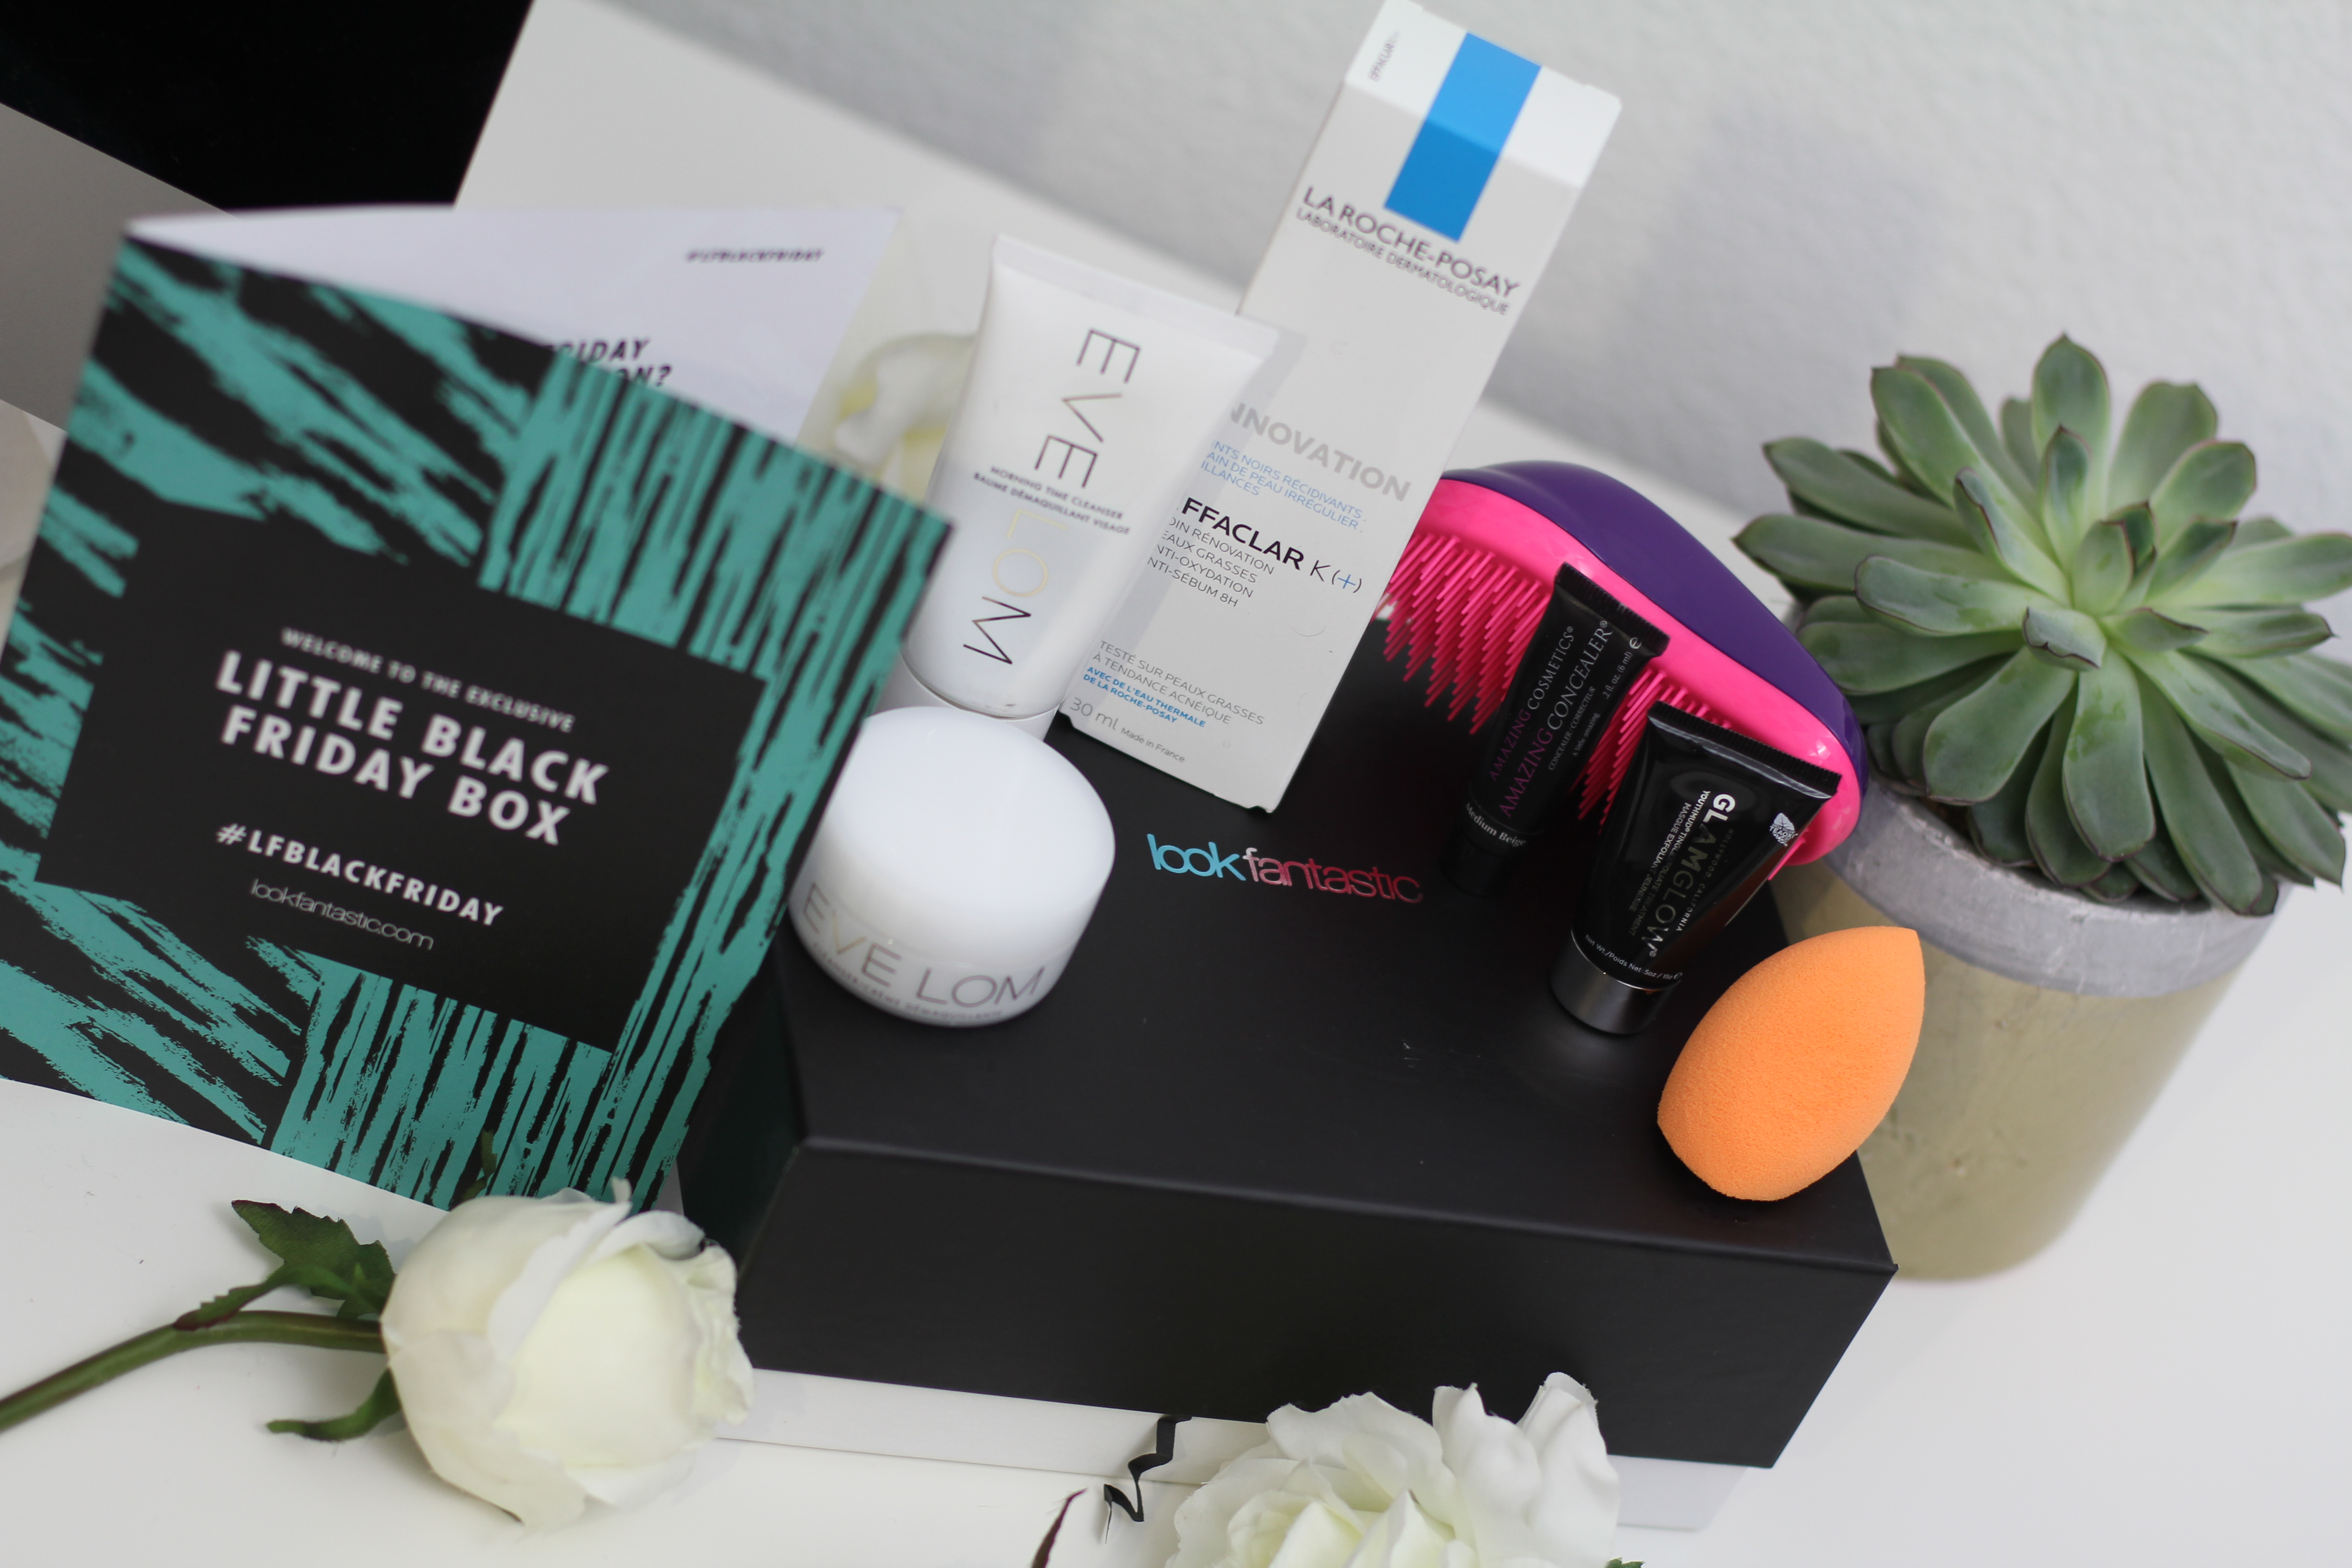 lookfantastic beauty box eve lom